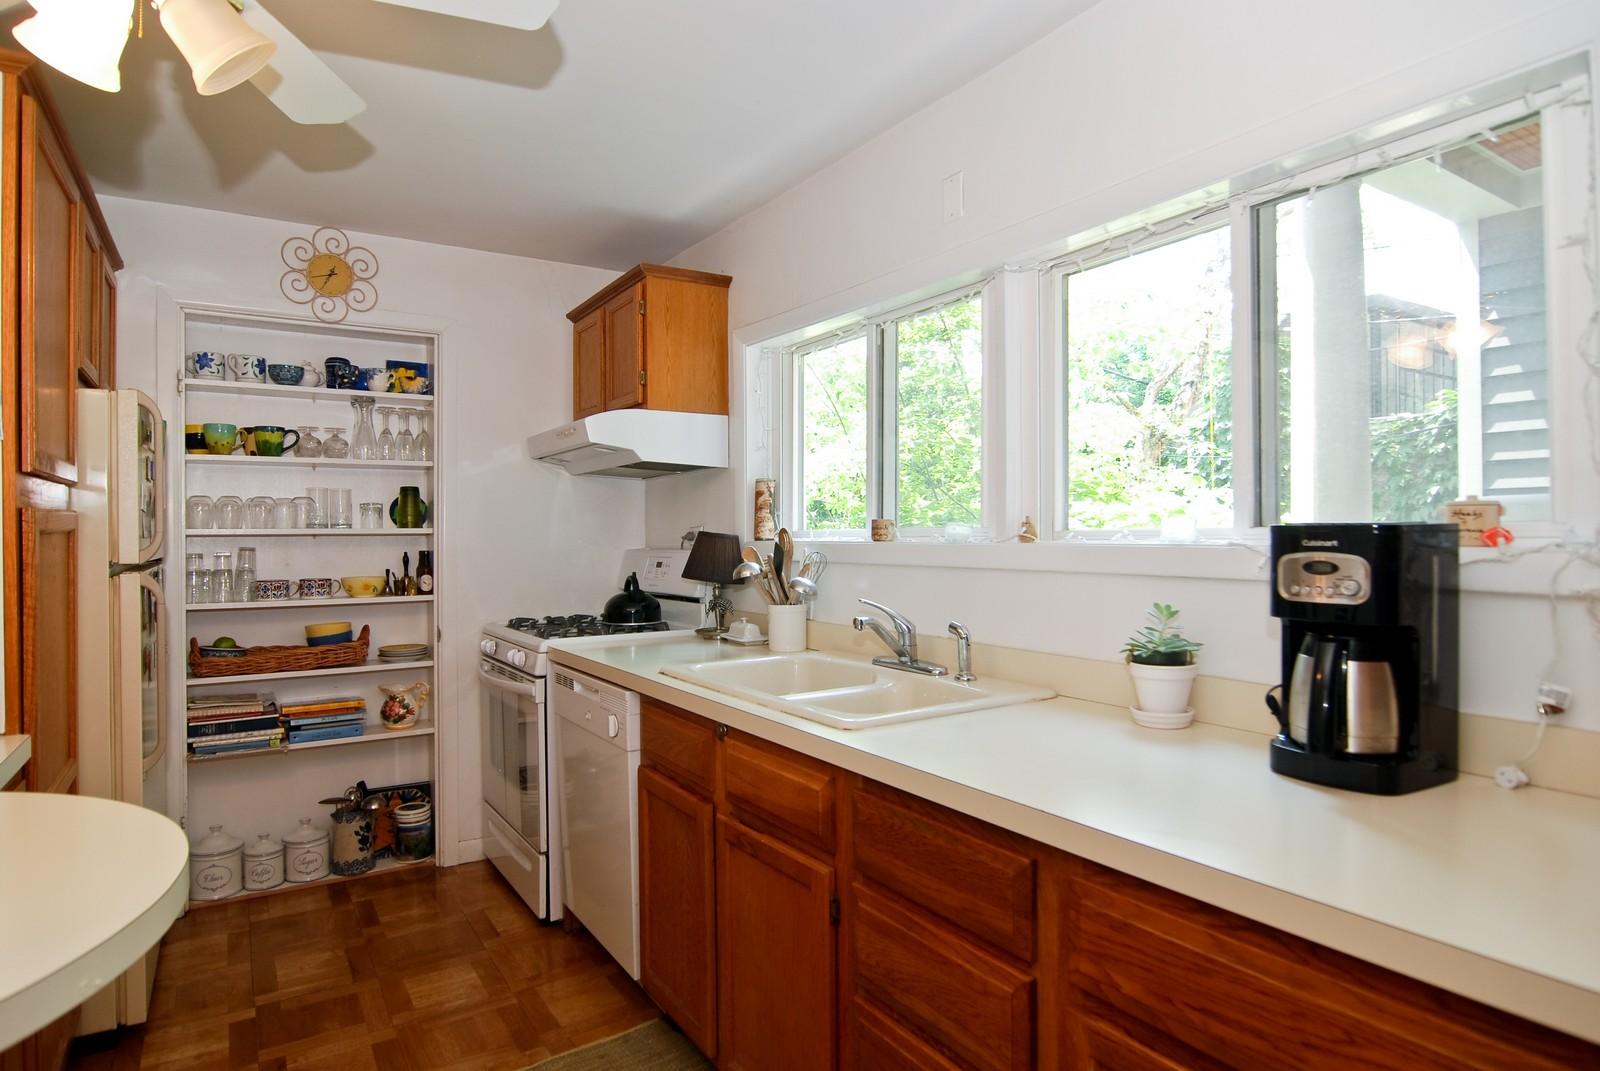 Real Estate Photography - 343 W Menomonee, Chicago, IL, 60614 - Kitchen